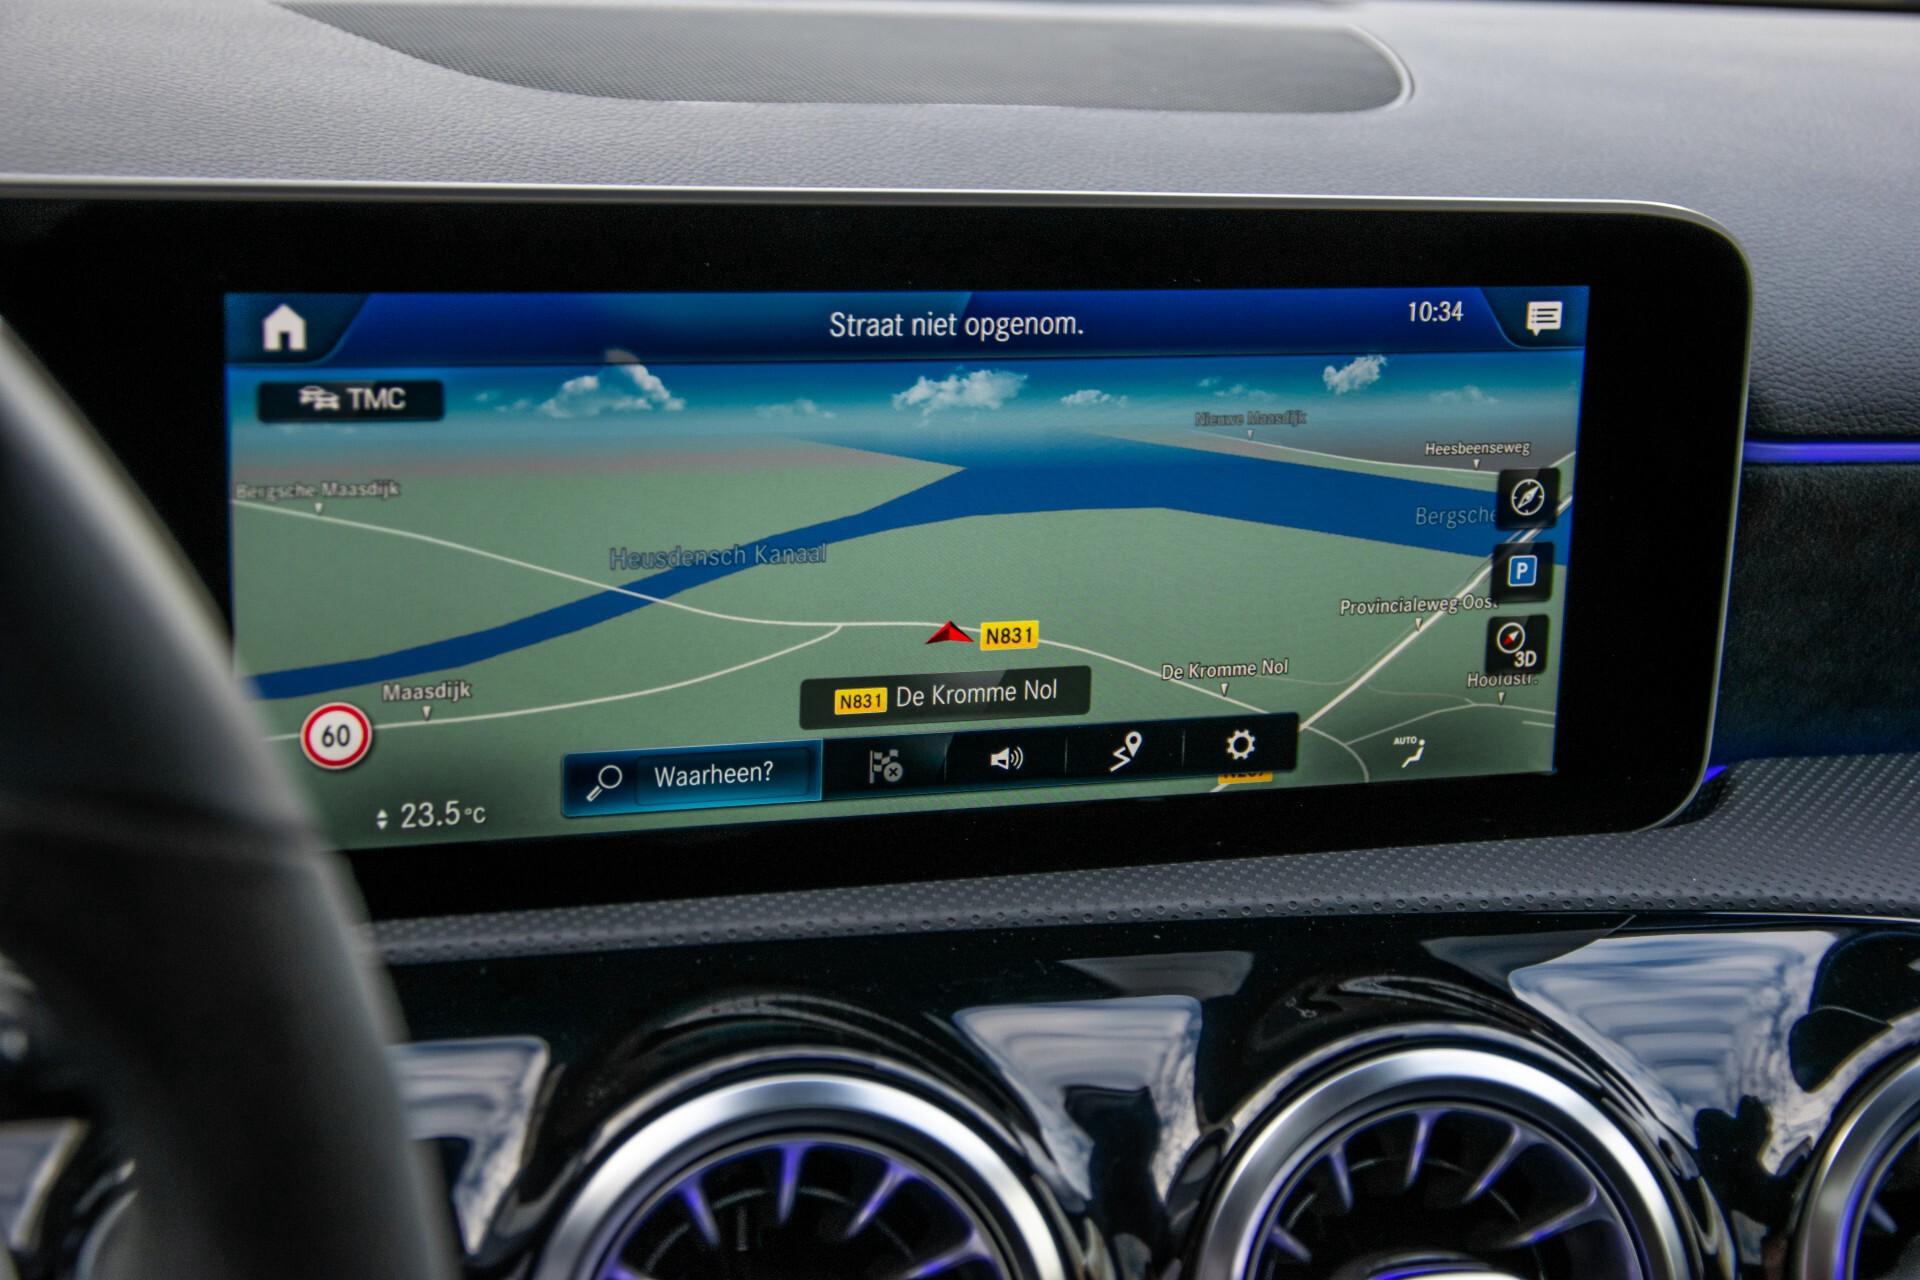 Mercedes-Benz A-Klasse 250 4-M AMG Panorama/Keyless-Entry/MBUX/HUD/Burmester/360/Multibeam LED Aut7 Foto 17